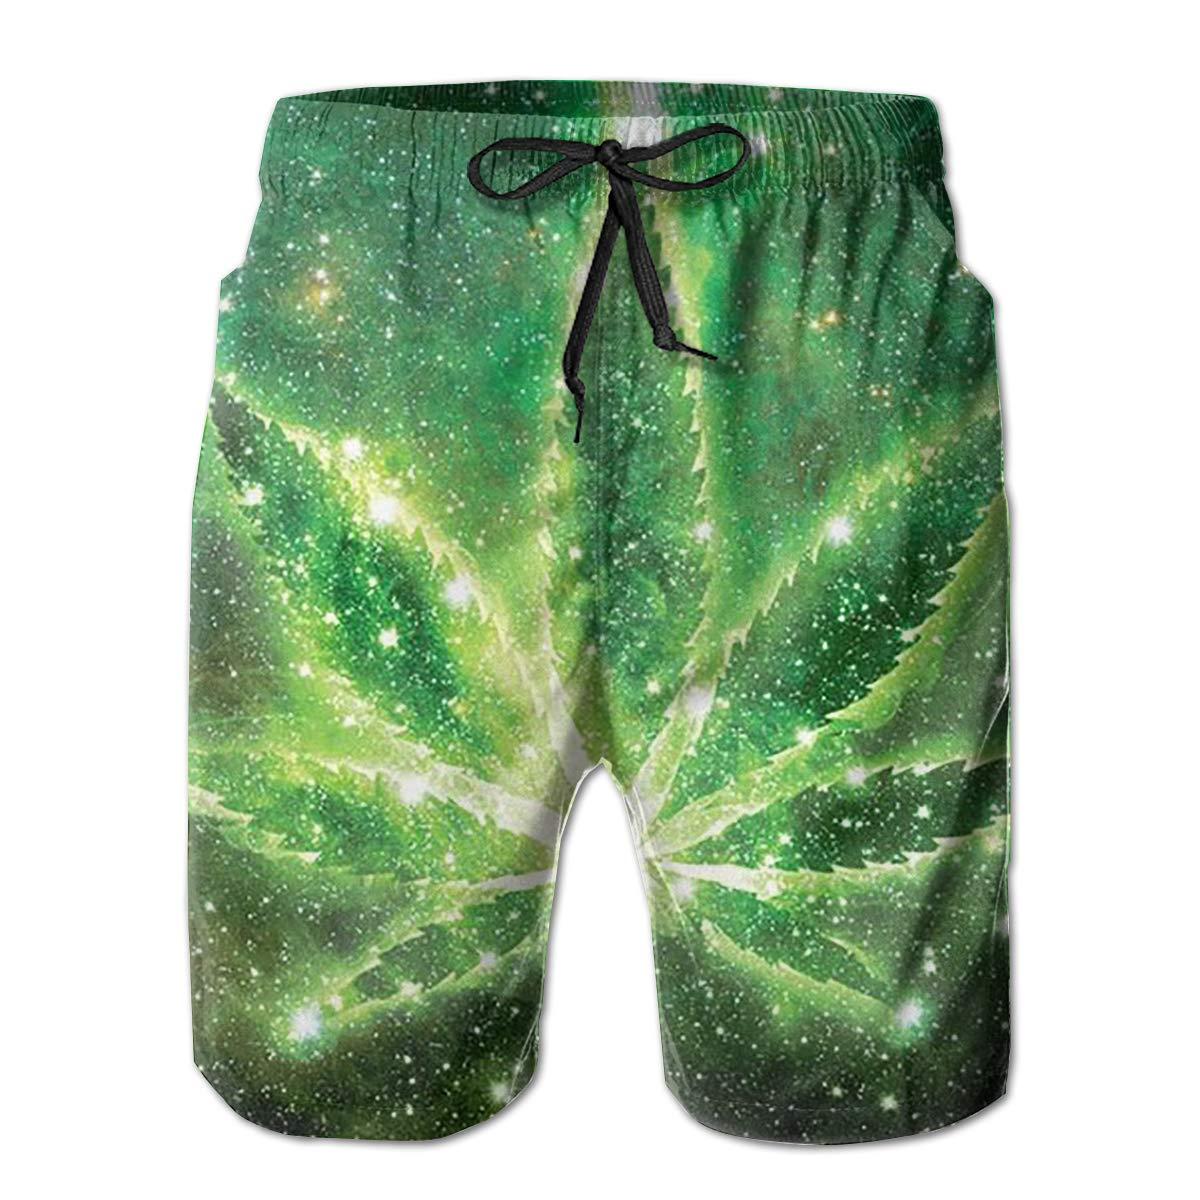 FUNSTYEET Green Weed Mens Board Shorts Swim Mesh Lining and Side Pocket